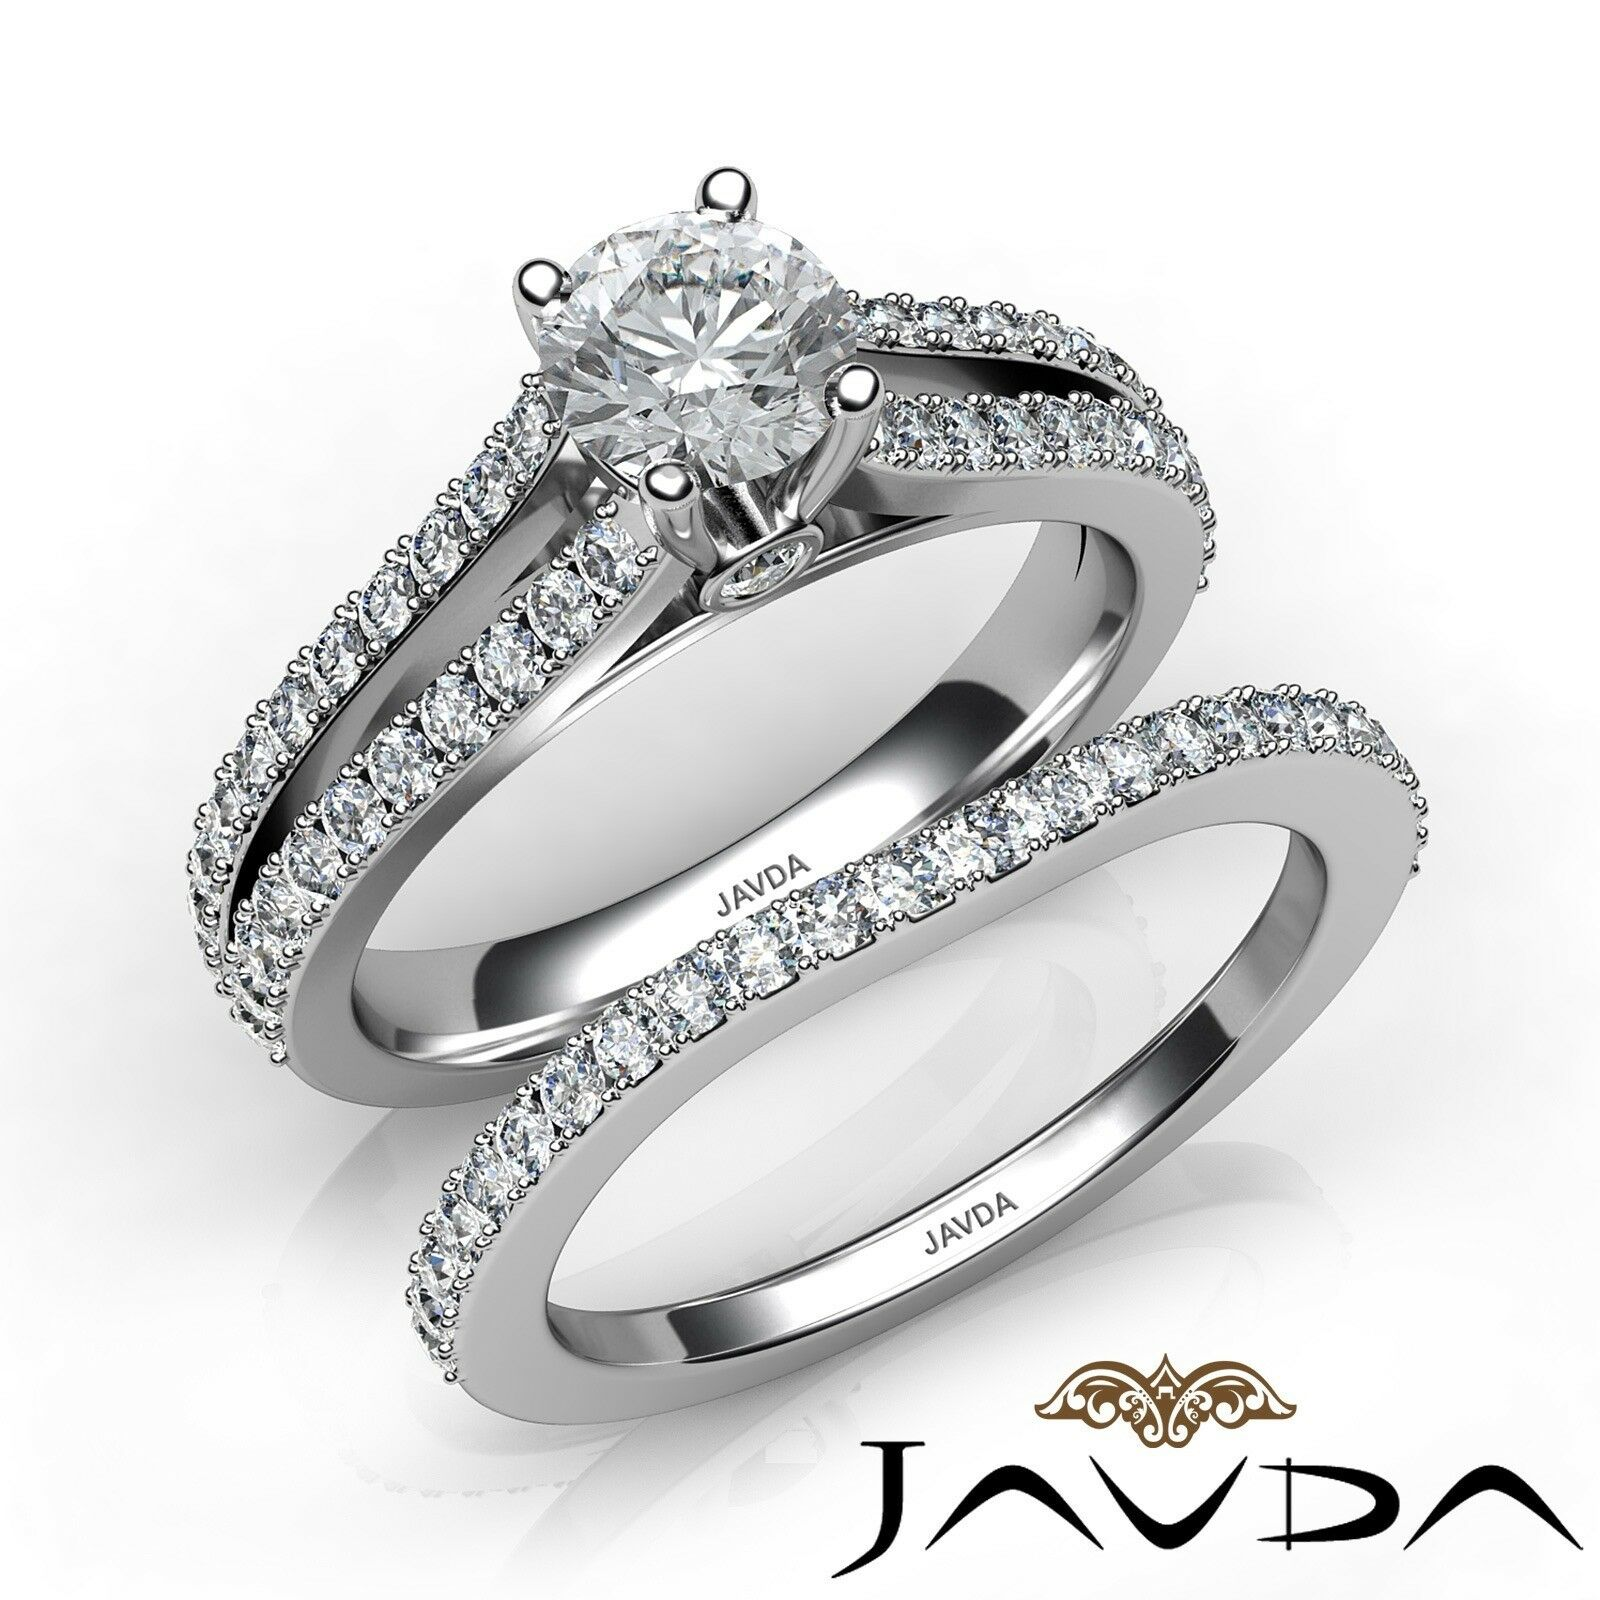 1.55ctw Peekaboo Wedding Bridal Round Diamond Engagement Ring GIA G-VS1 W Gold